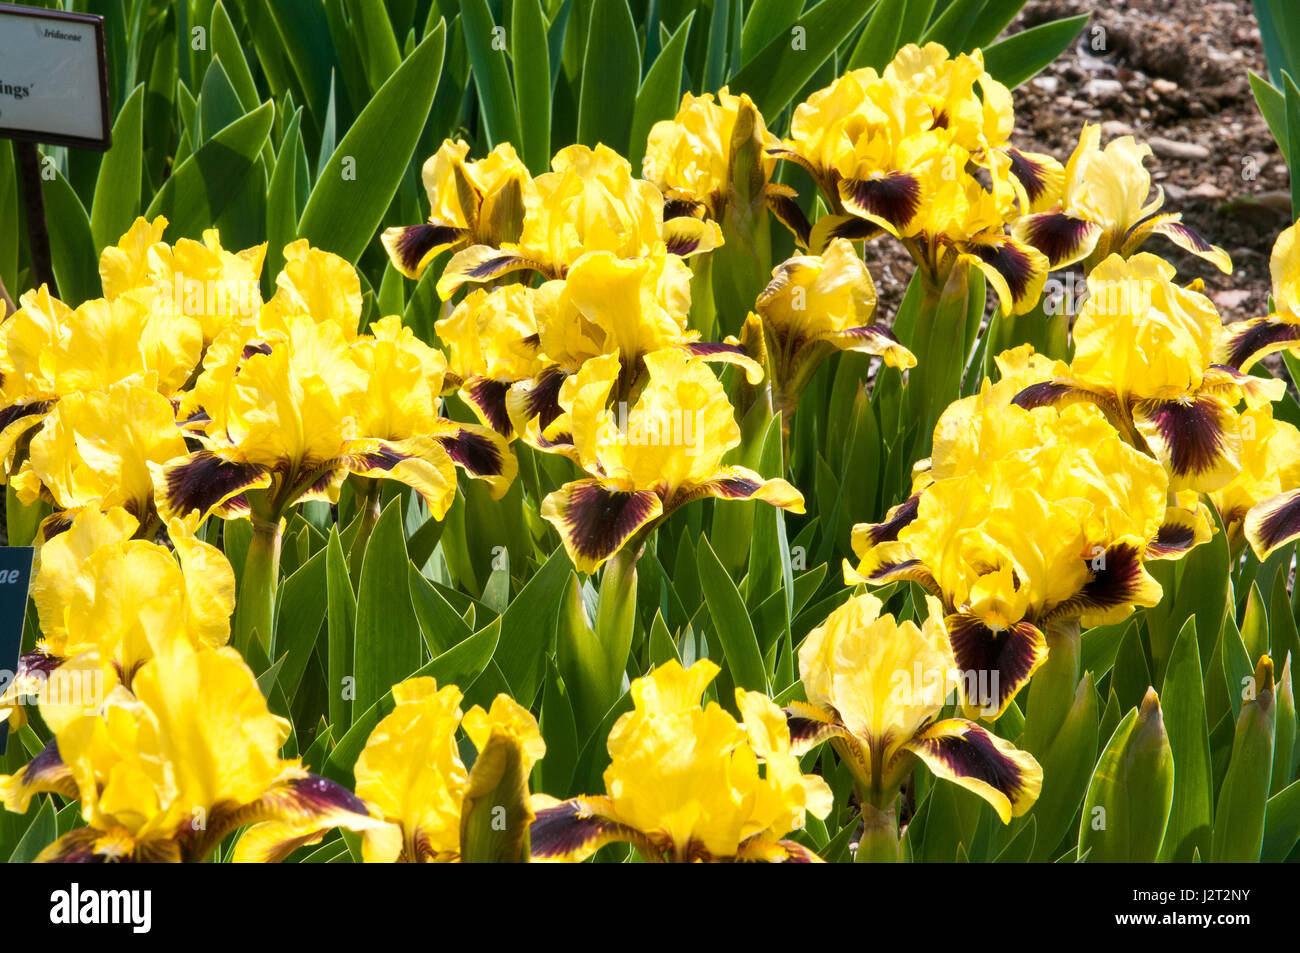 Iris Is A Genus Of Monocotyledonous Plants Of The Iridaceae Family